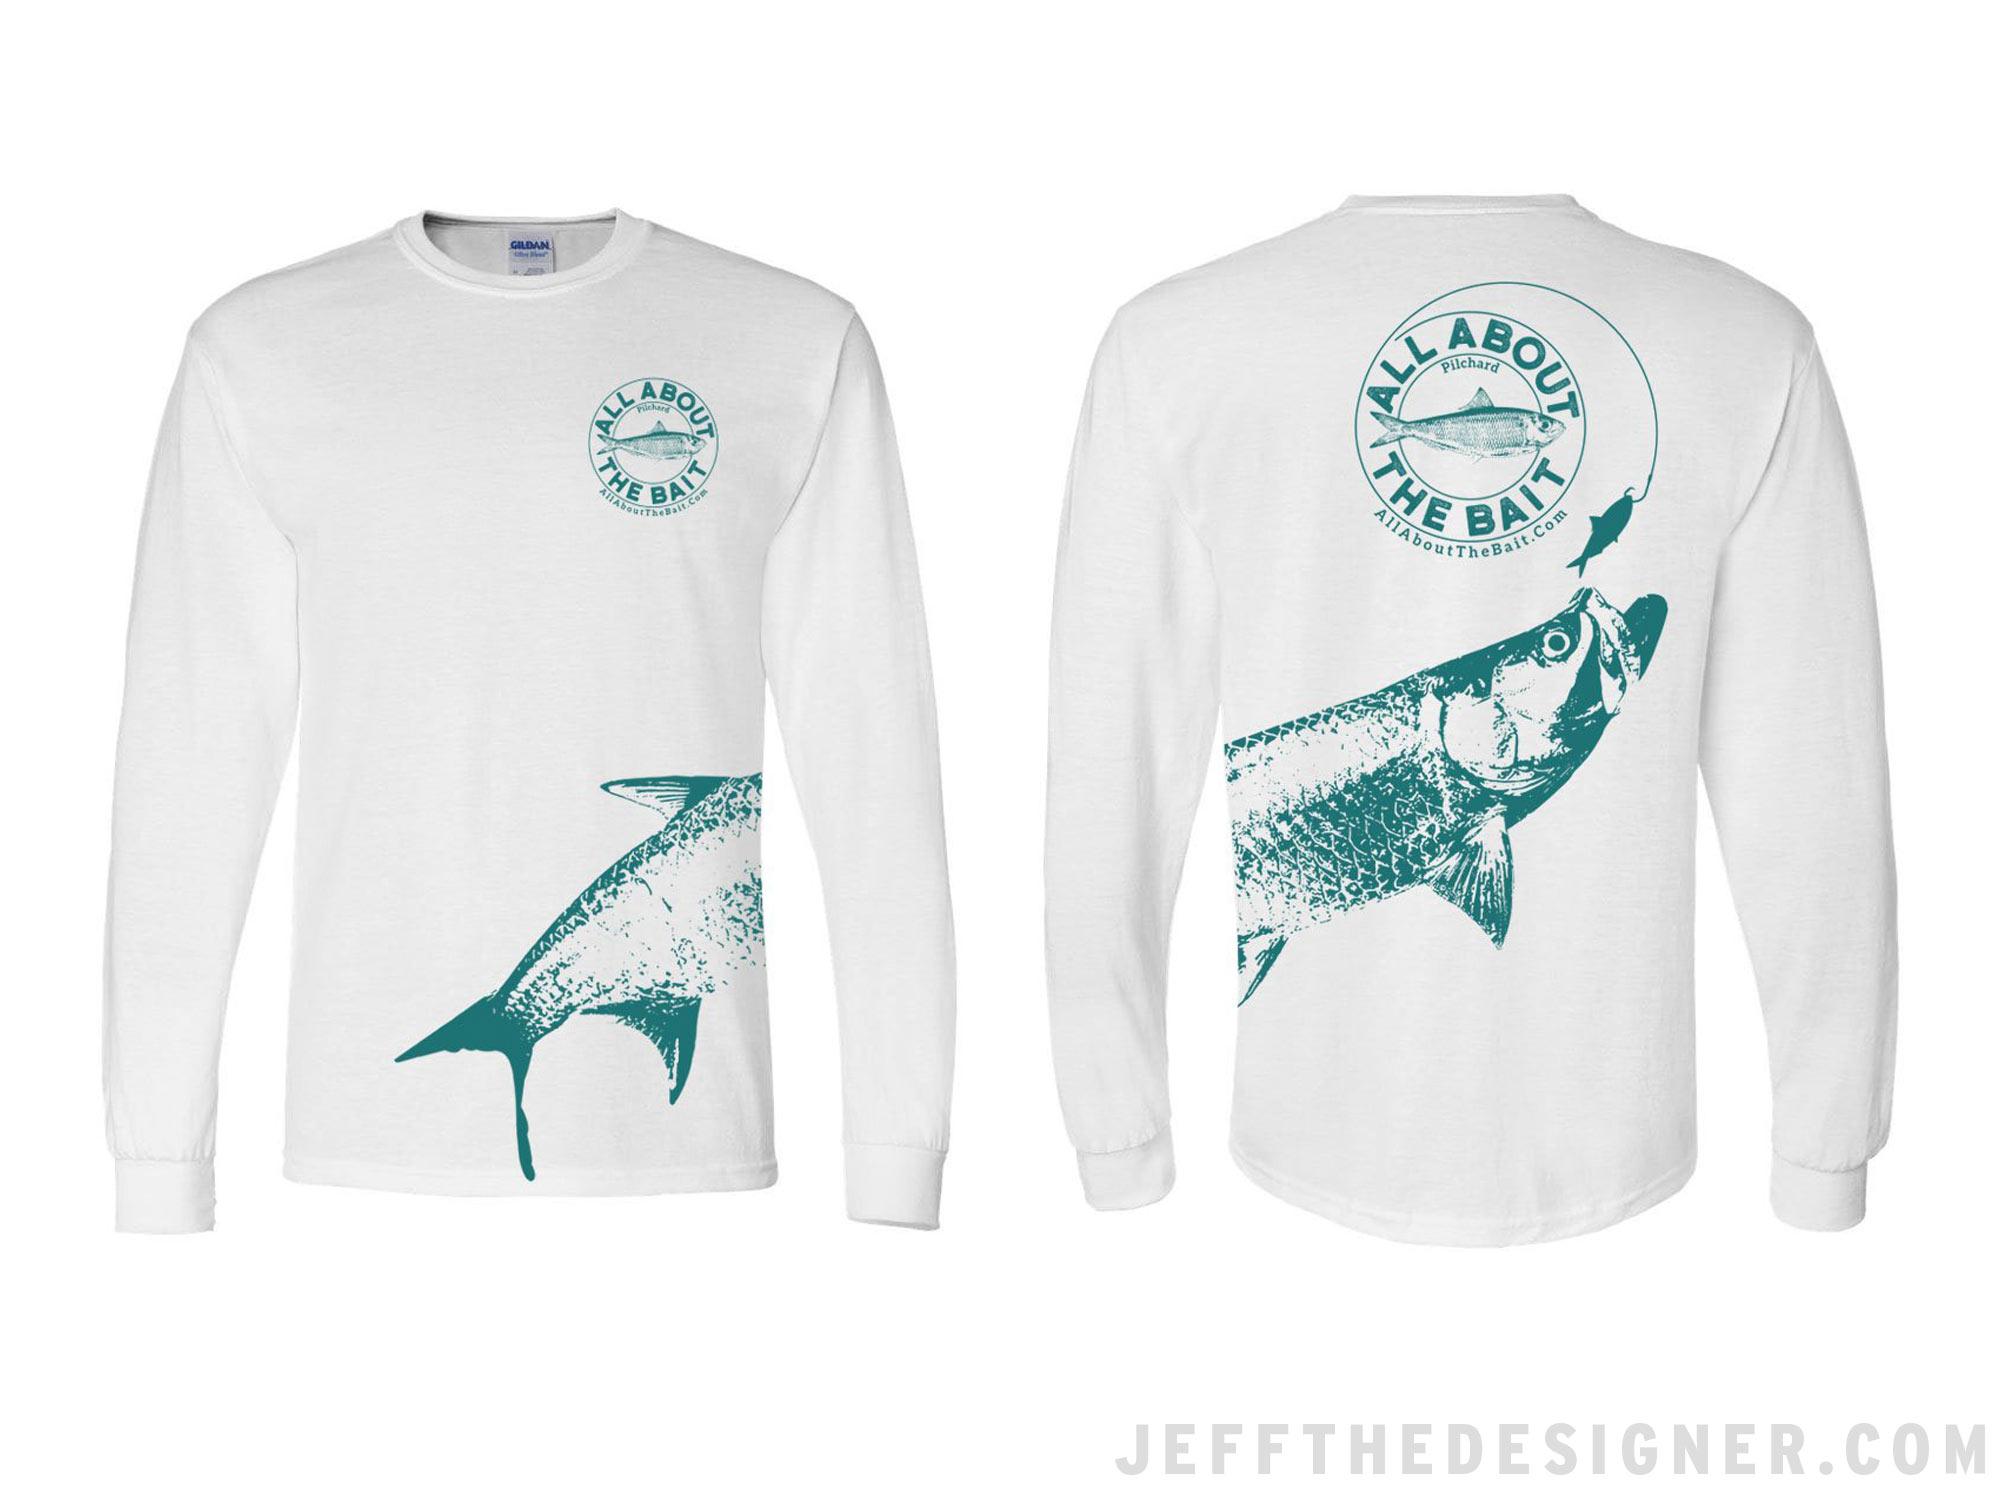 Fishing Shirt Design - Tarpon